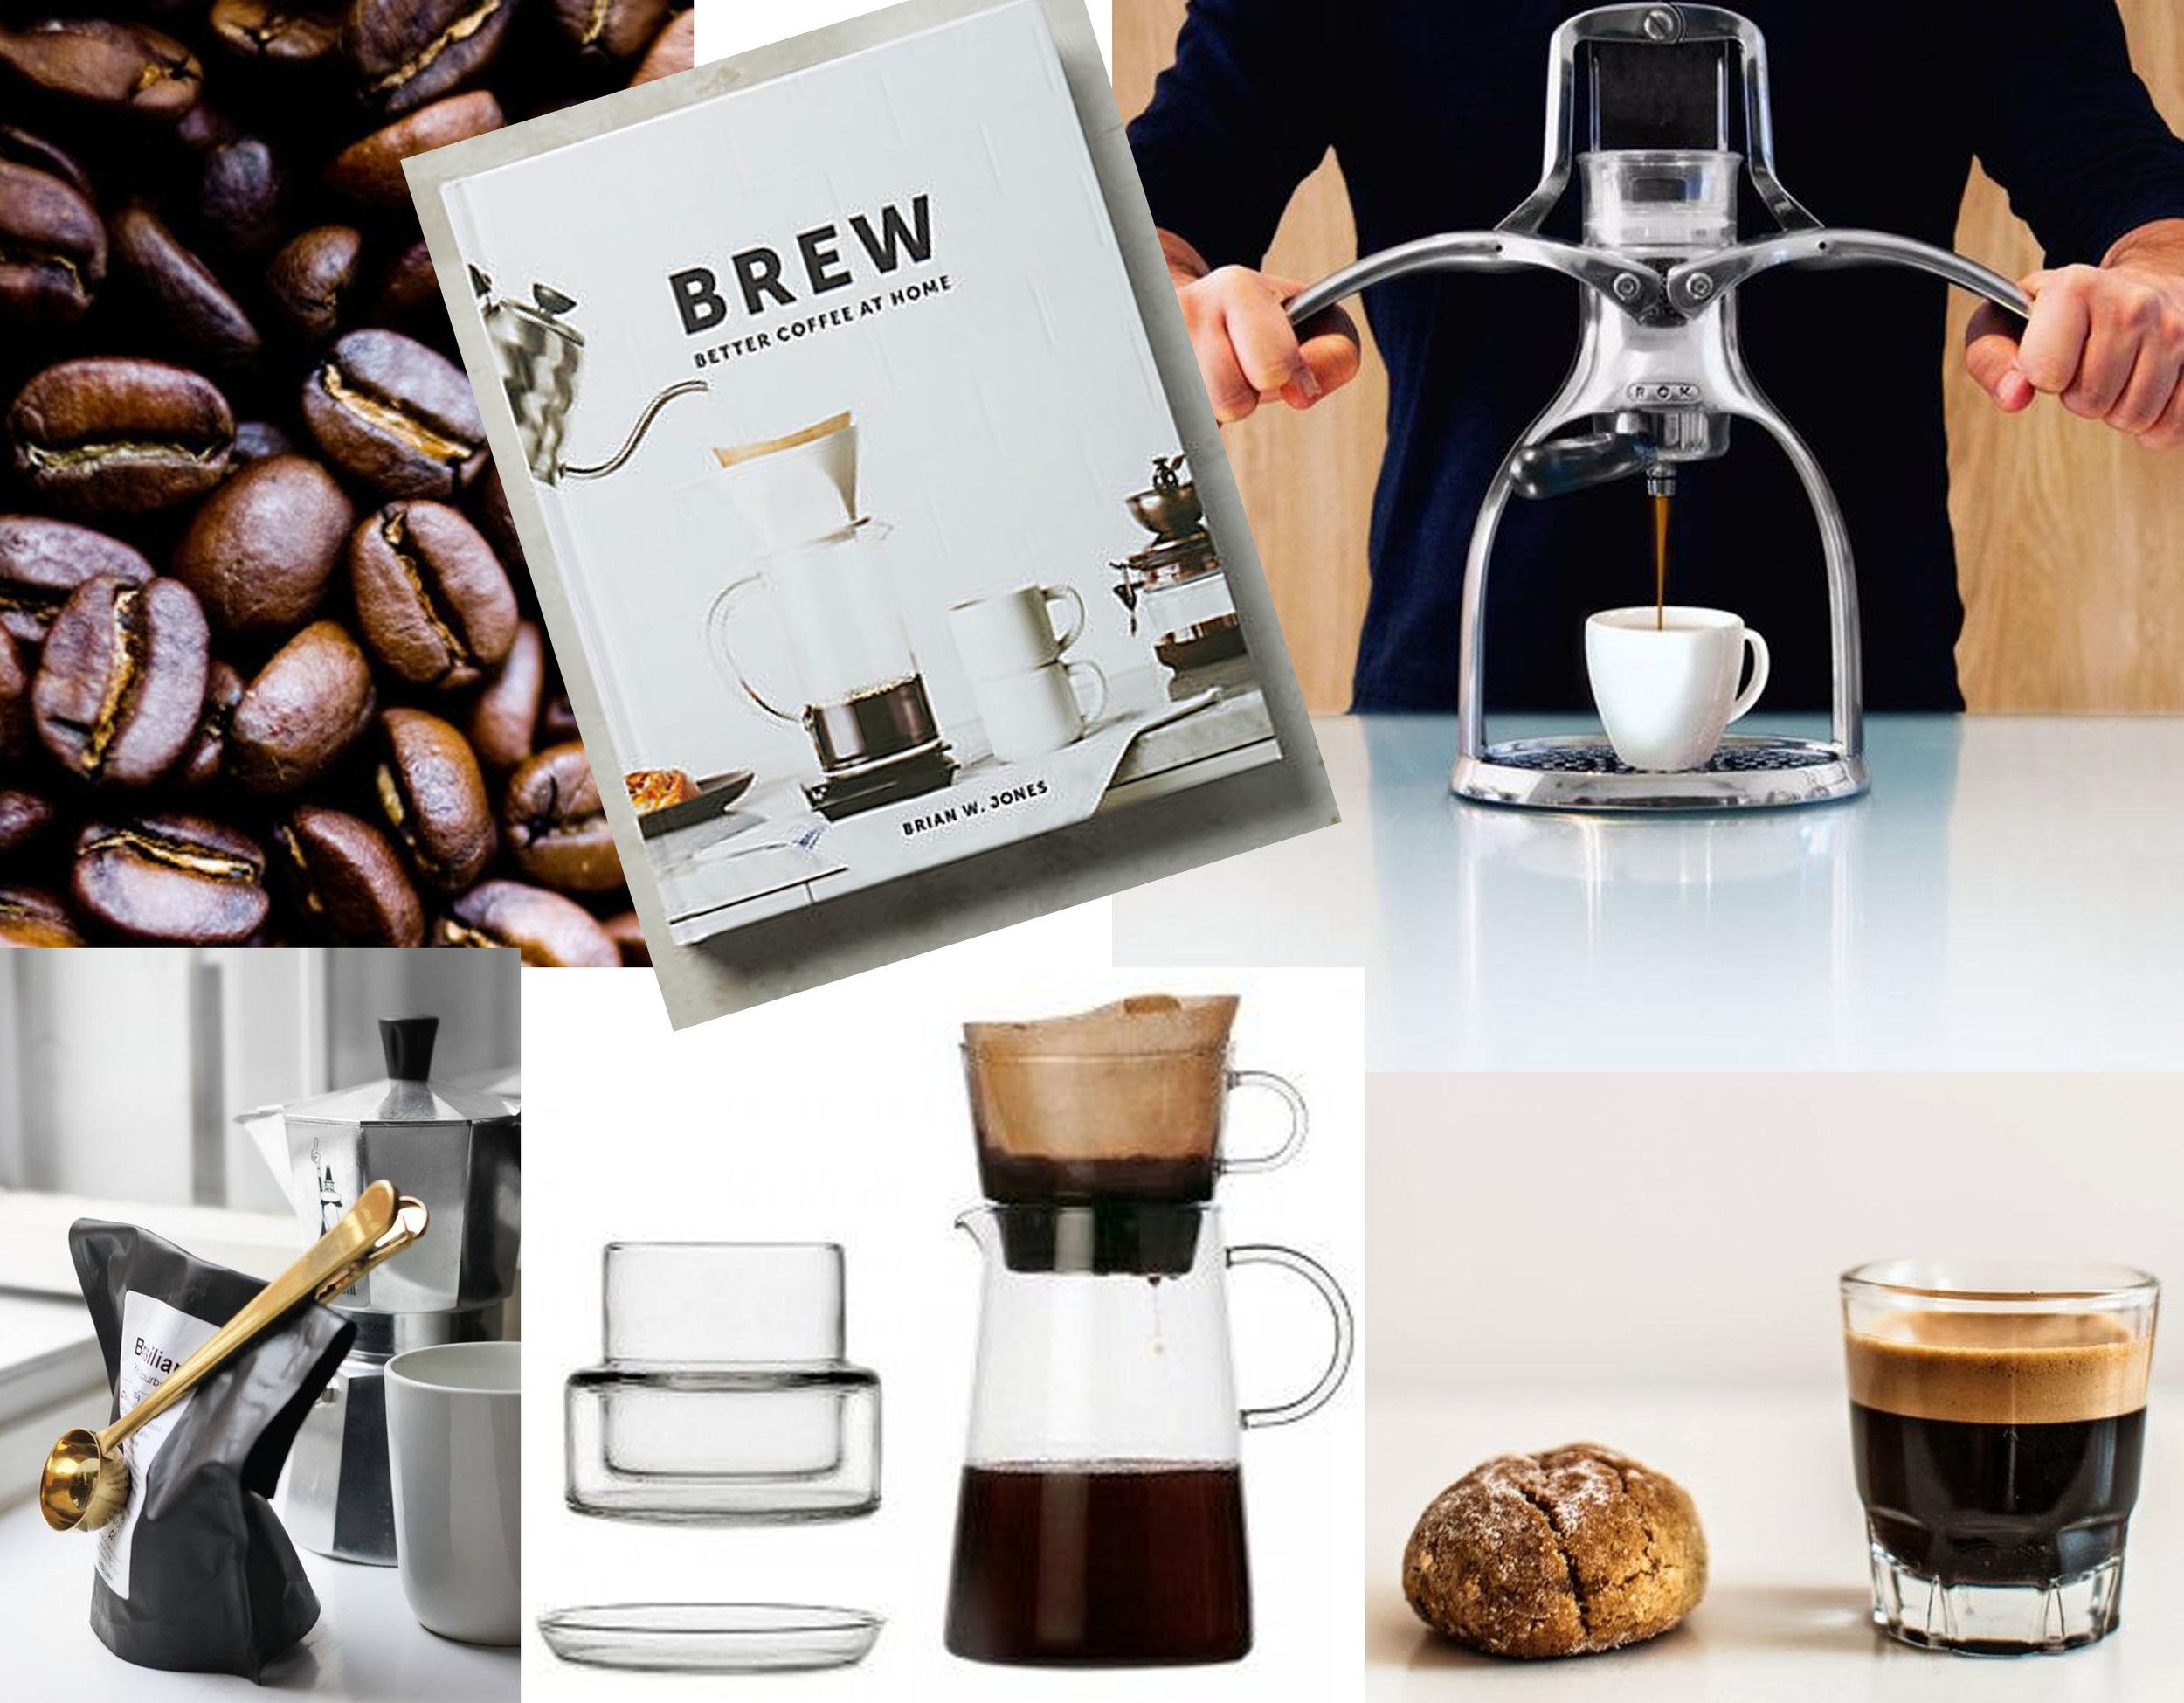 image coffee beans via   Bon Appetit  - Brew: better coffee at home  Amazon  - Rok espresso maker  Rok Kitchen Tools  - cup and Penguin coffee pot  Ichendorf Milano  - Clip Clip by  Hay  - image espresso via  Pinterest